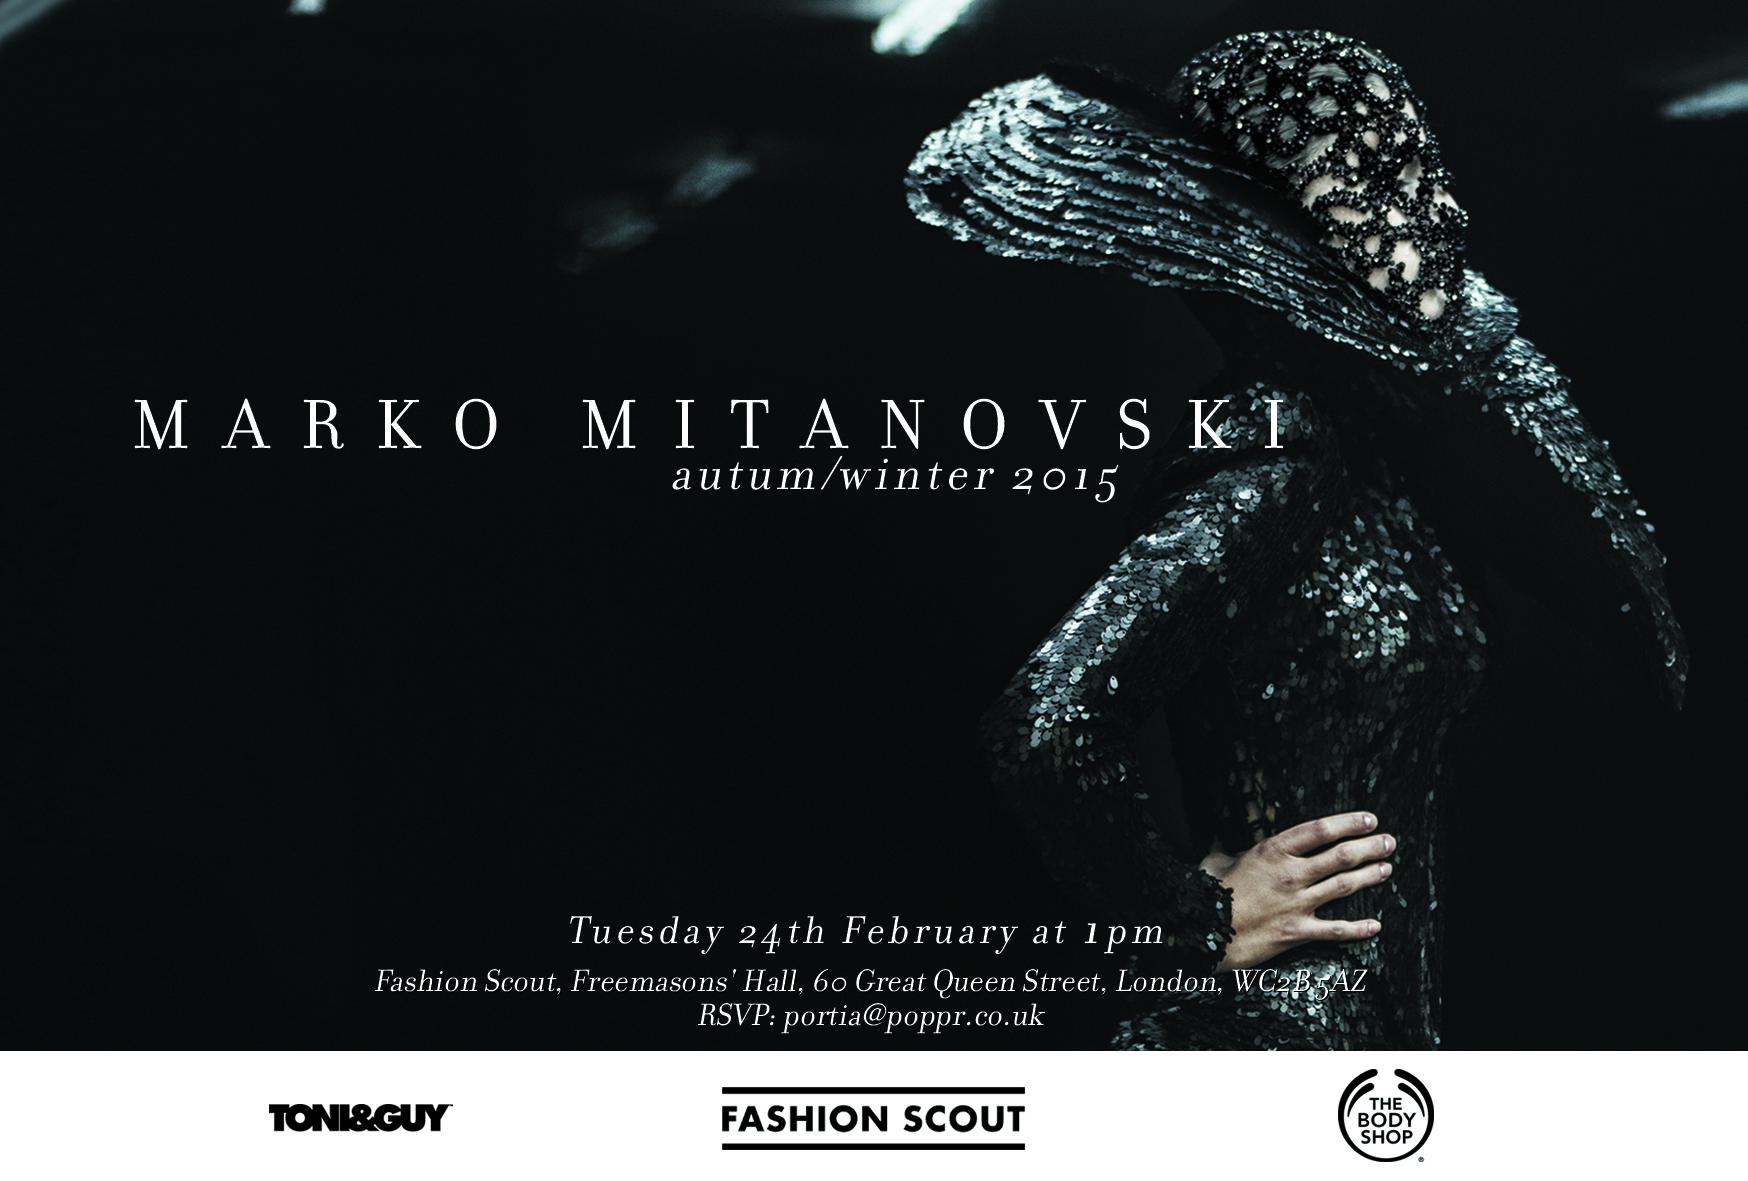 Marko Mitanovski invitation